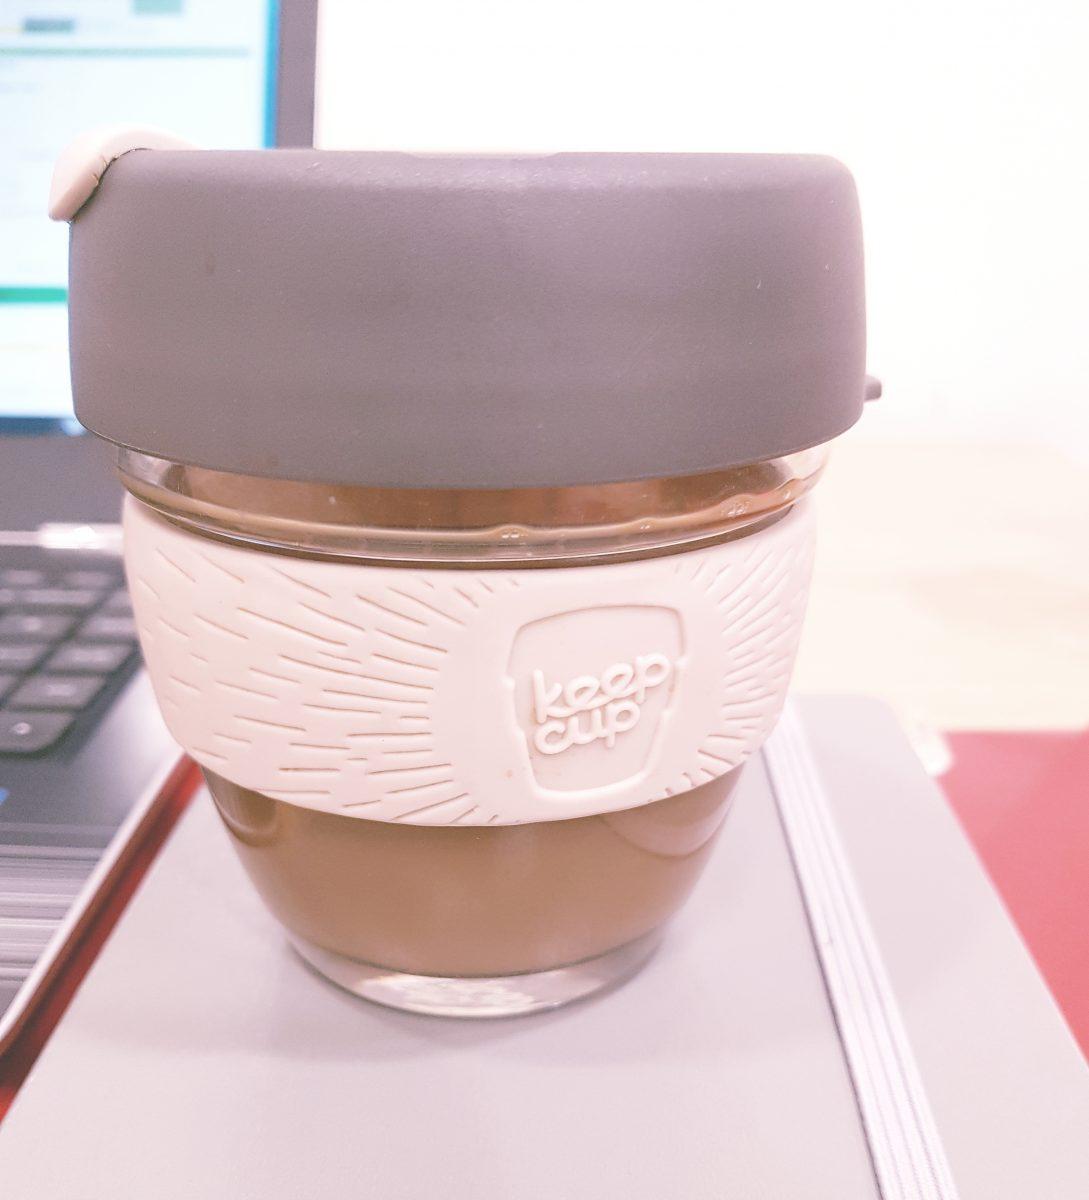 KeepCup reusable cup